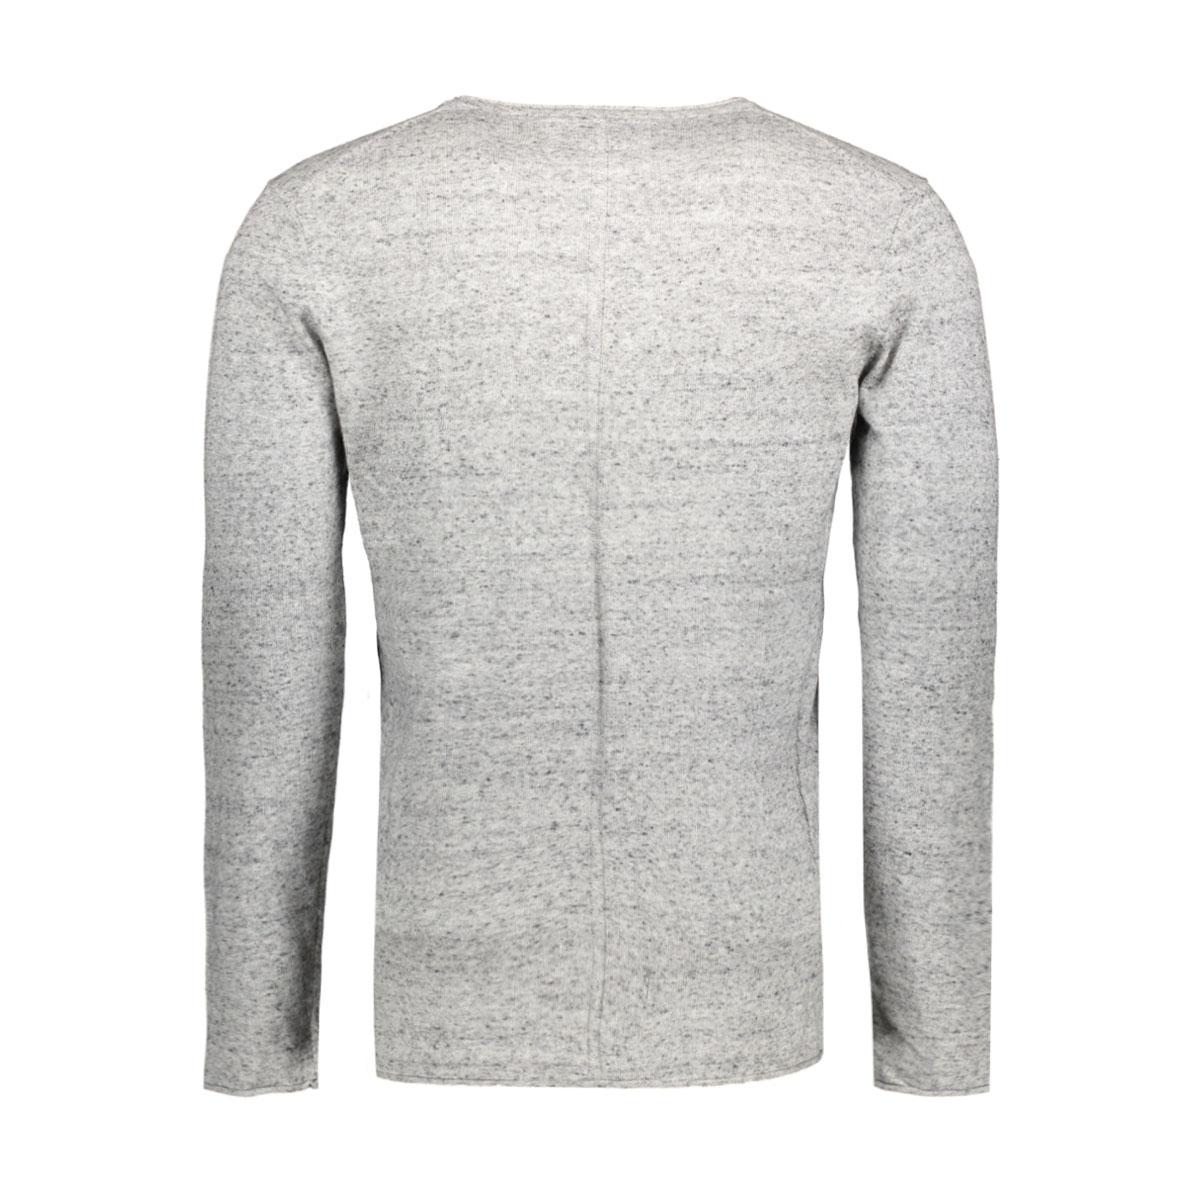 h71240 garcia sweater 66 grey melee